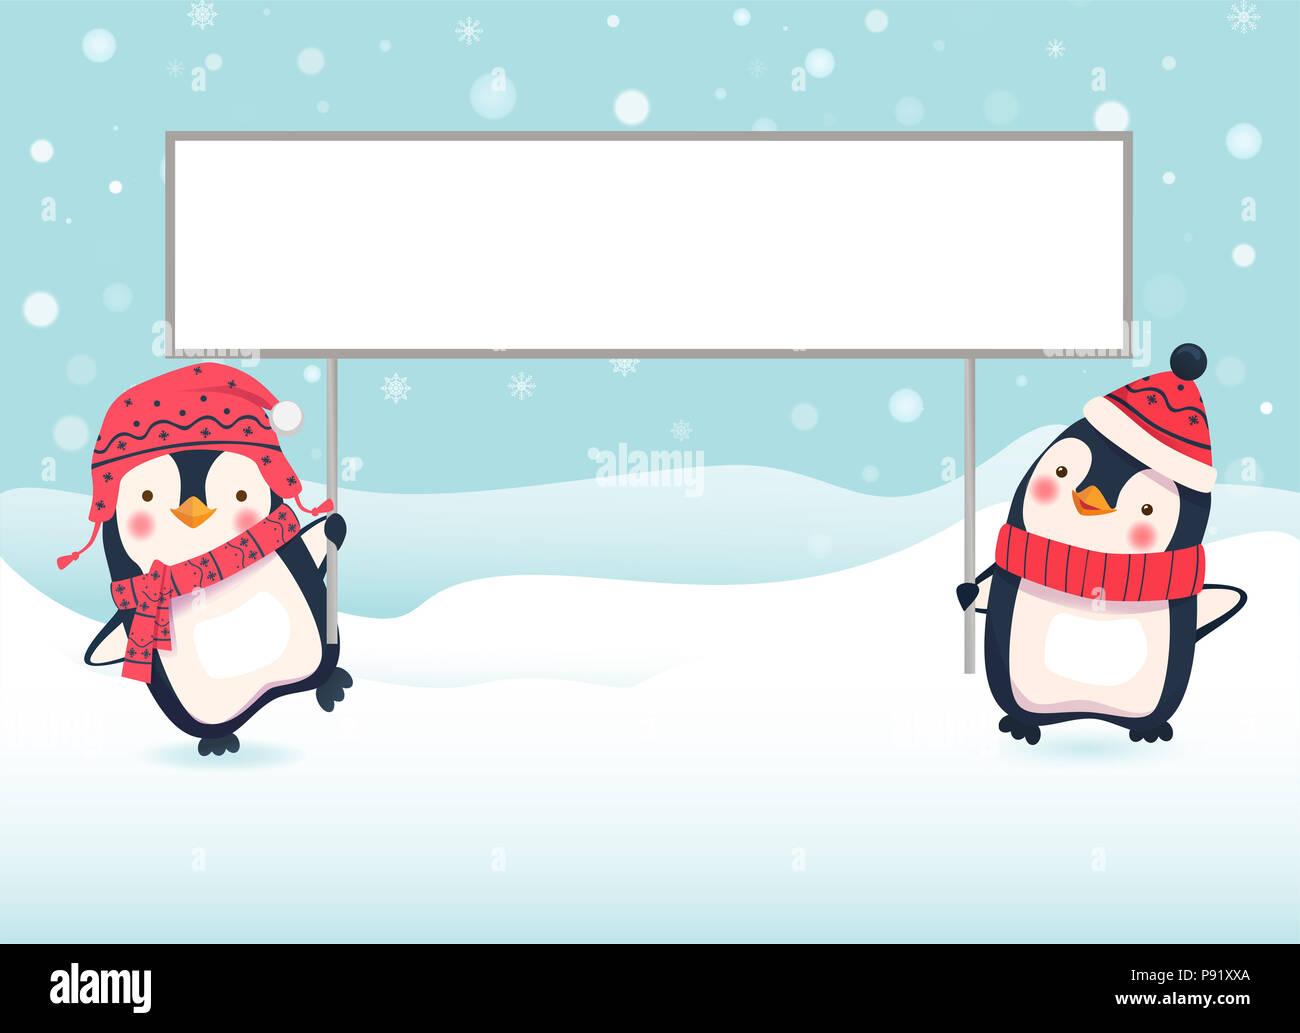 Penguin Cartoon Illustration Two Penguins Holding Banner Stock Photo Alamy